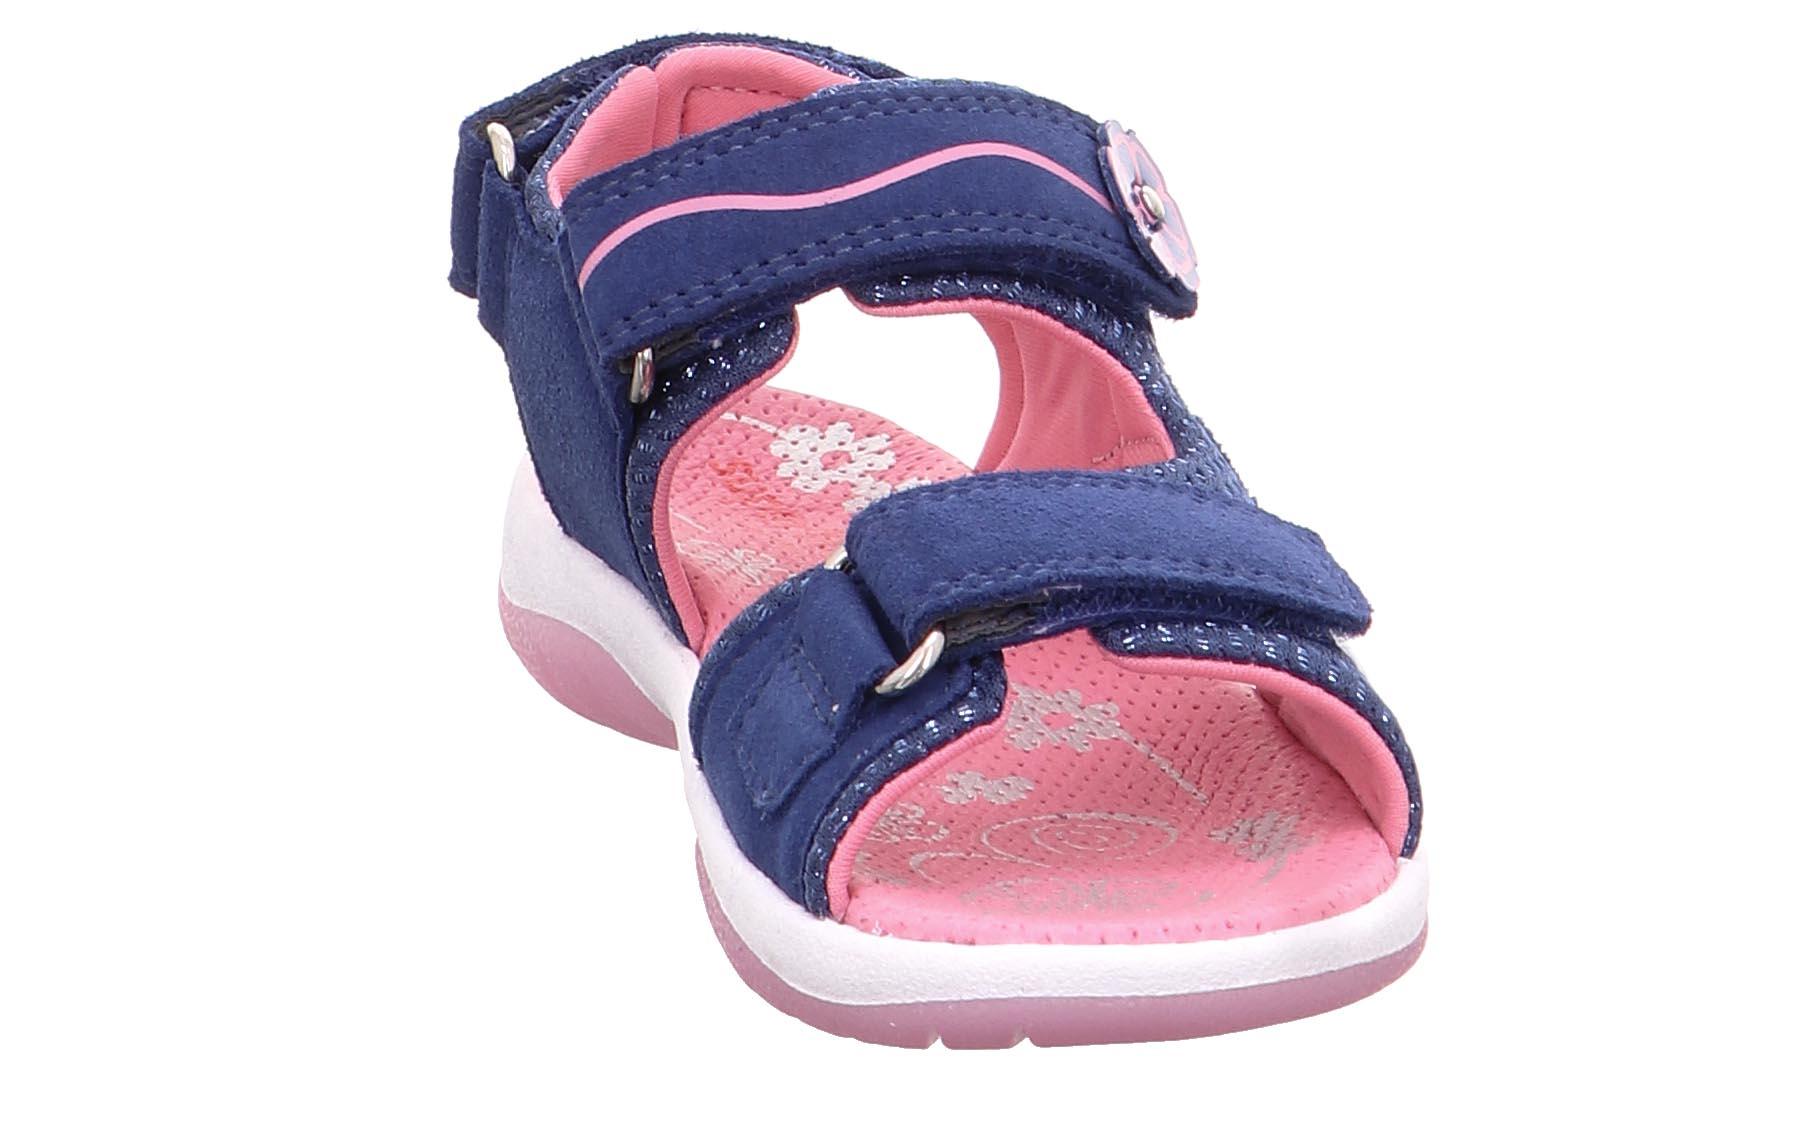 Sandales Compens/ées Fille Sunny-U